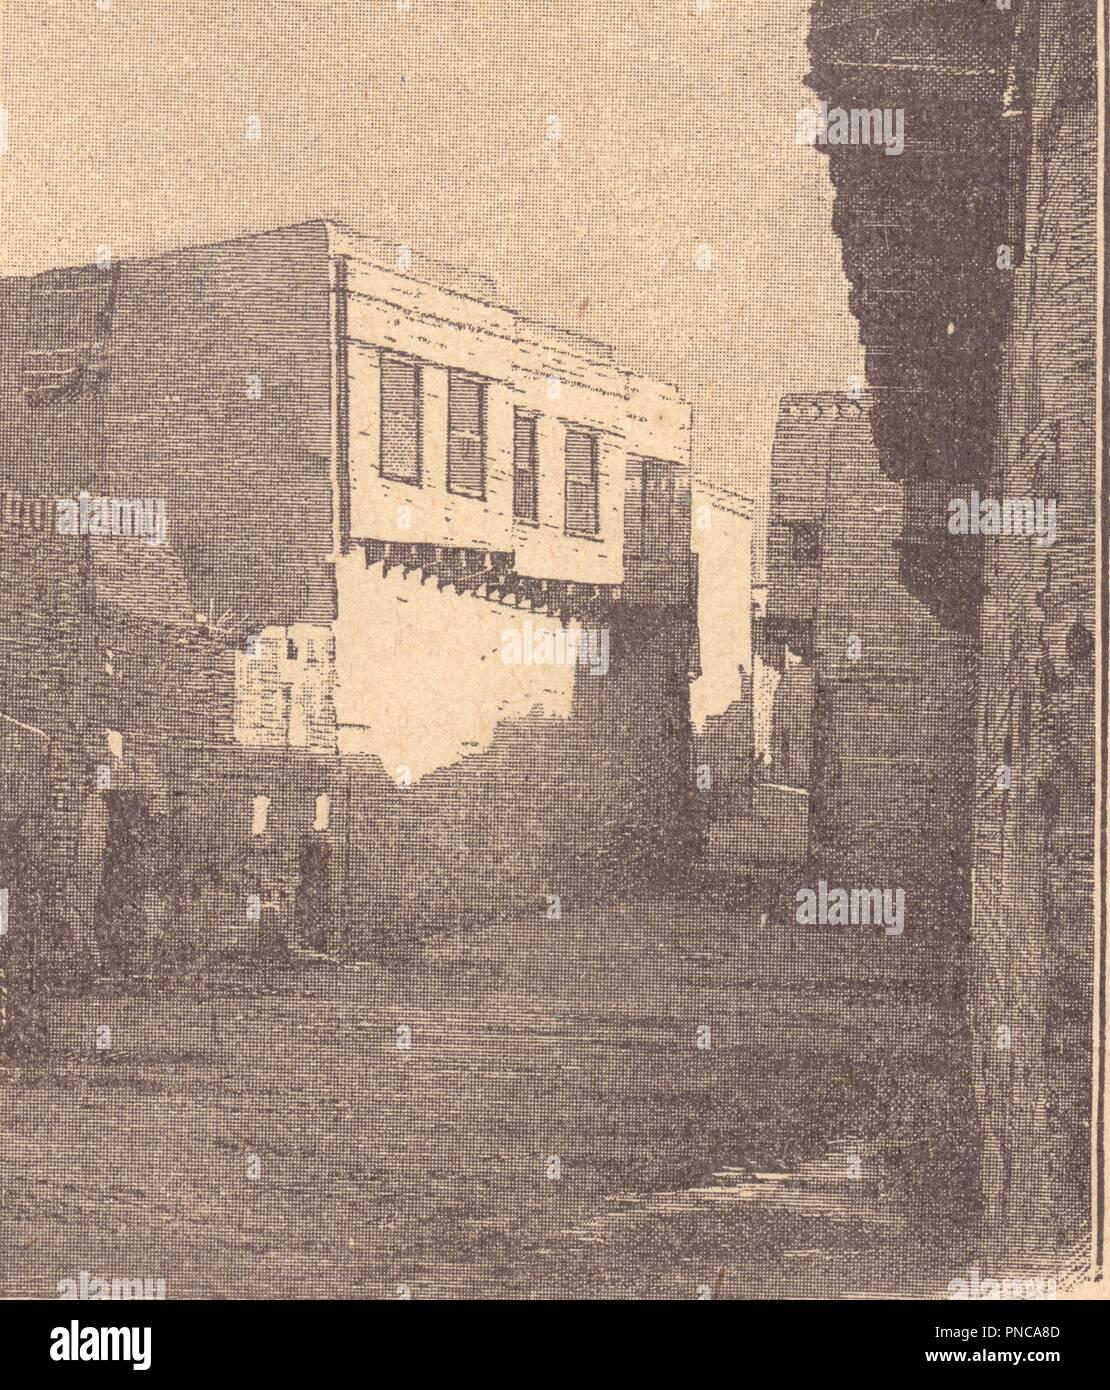 maison égyptienne - Stock Image